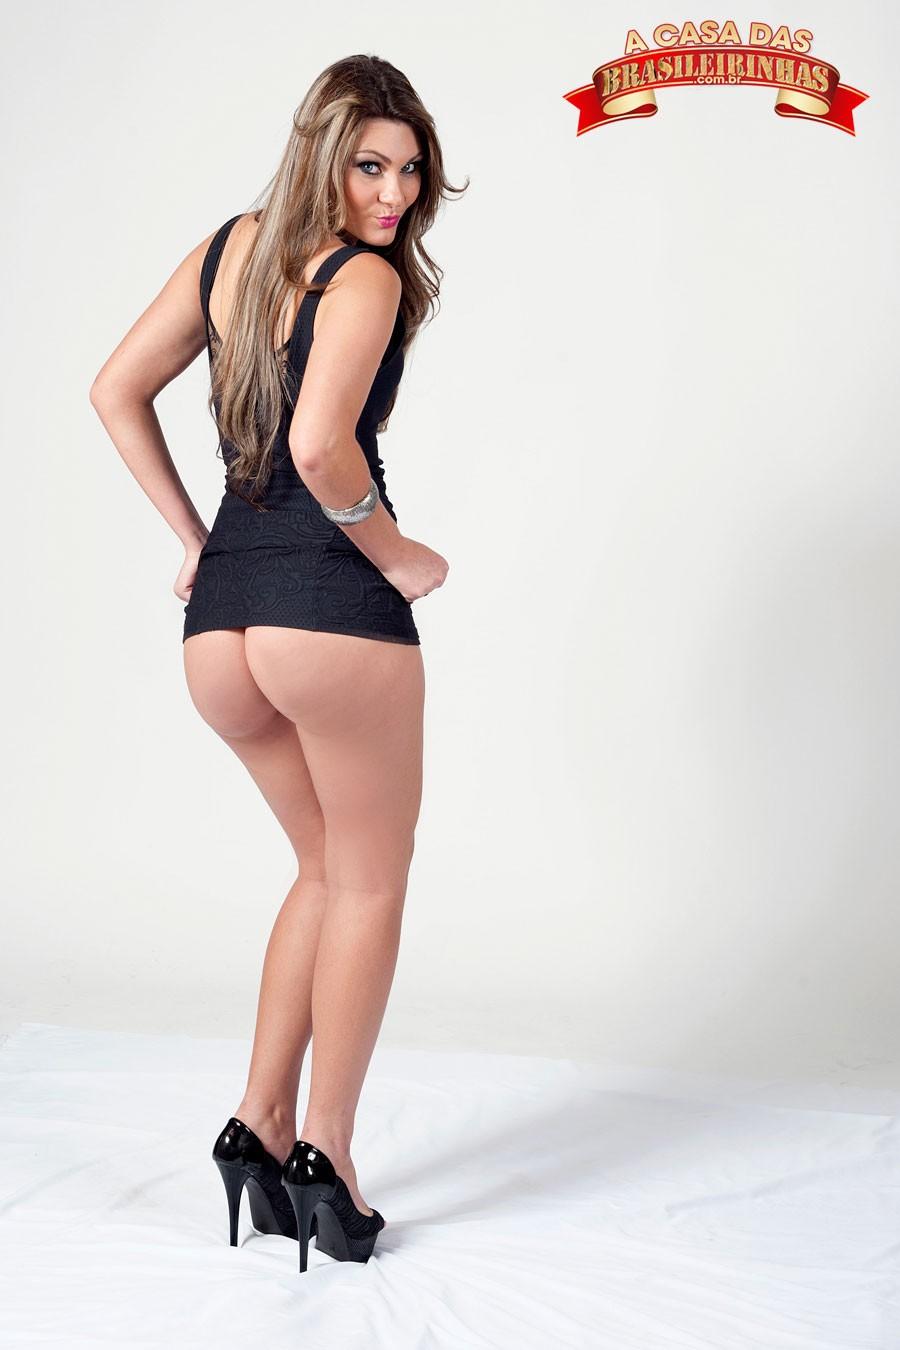 nayra-mendes-com-vestido-levantado.jpg